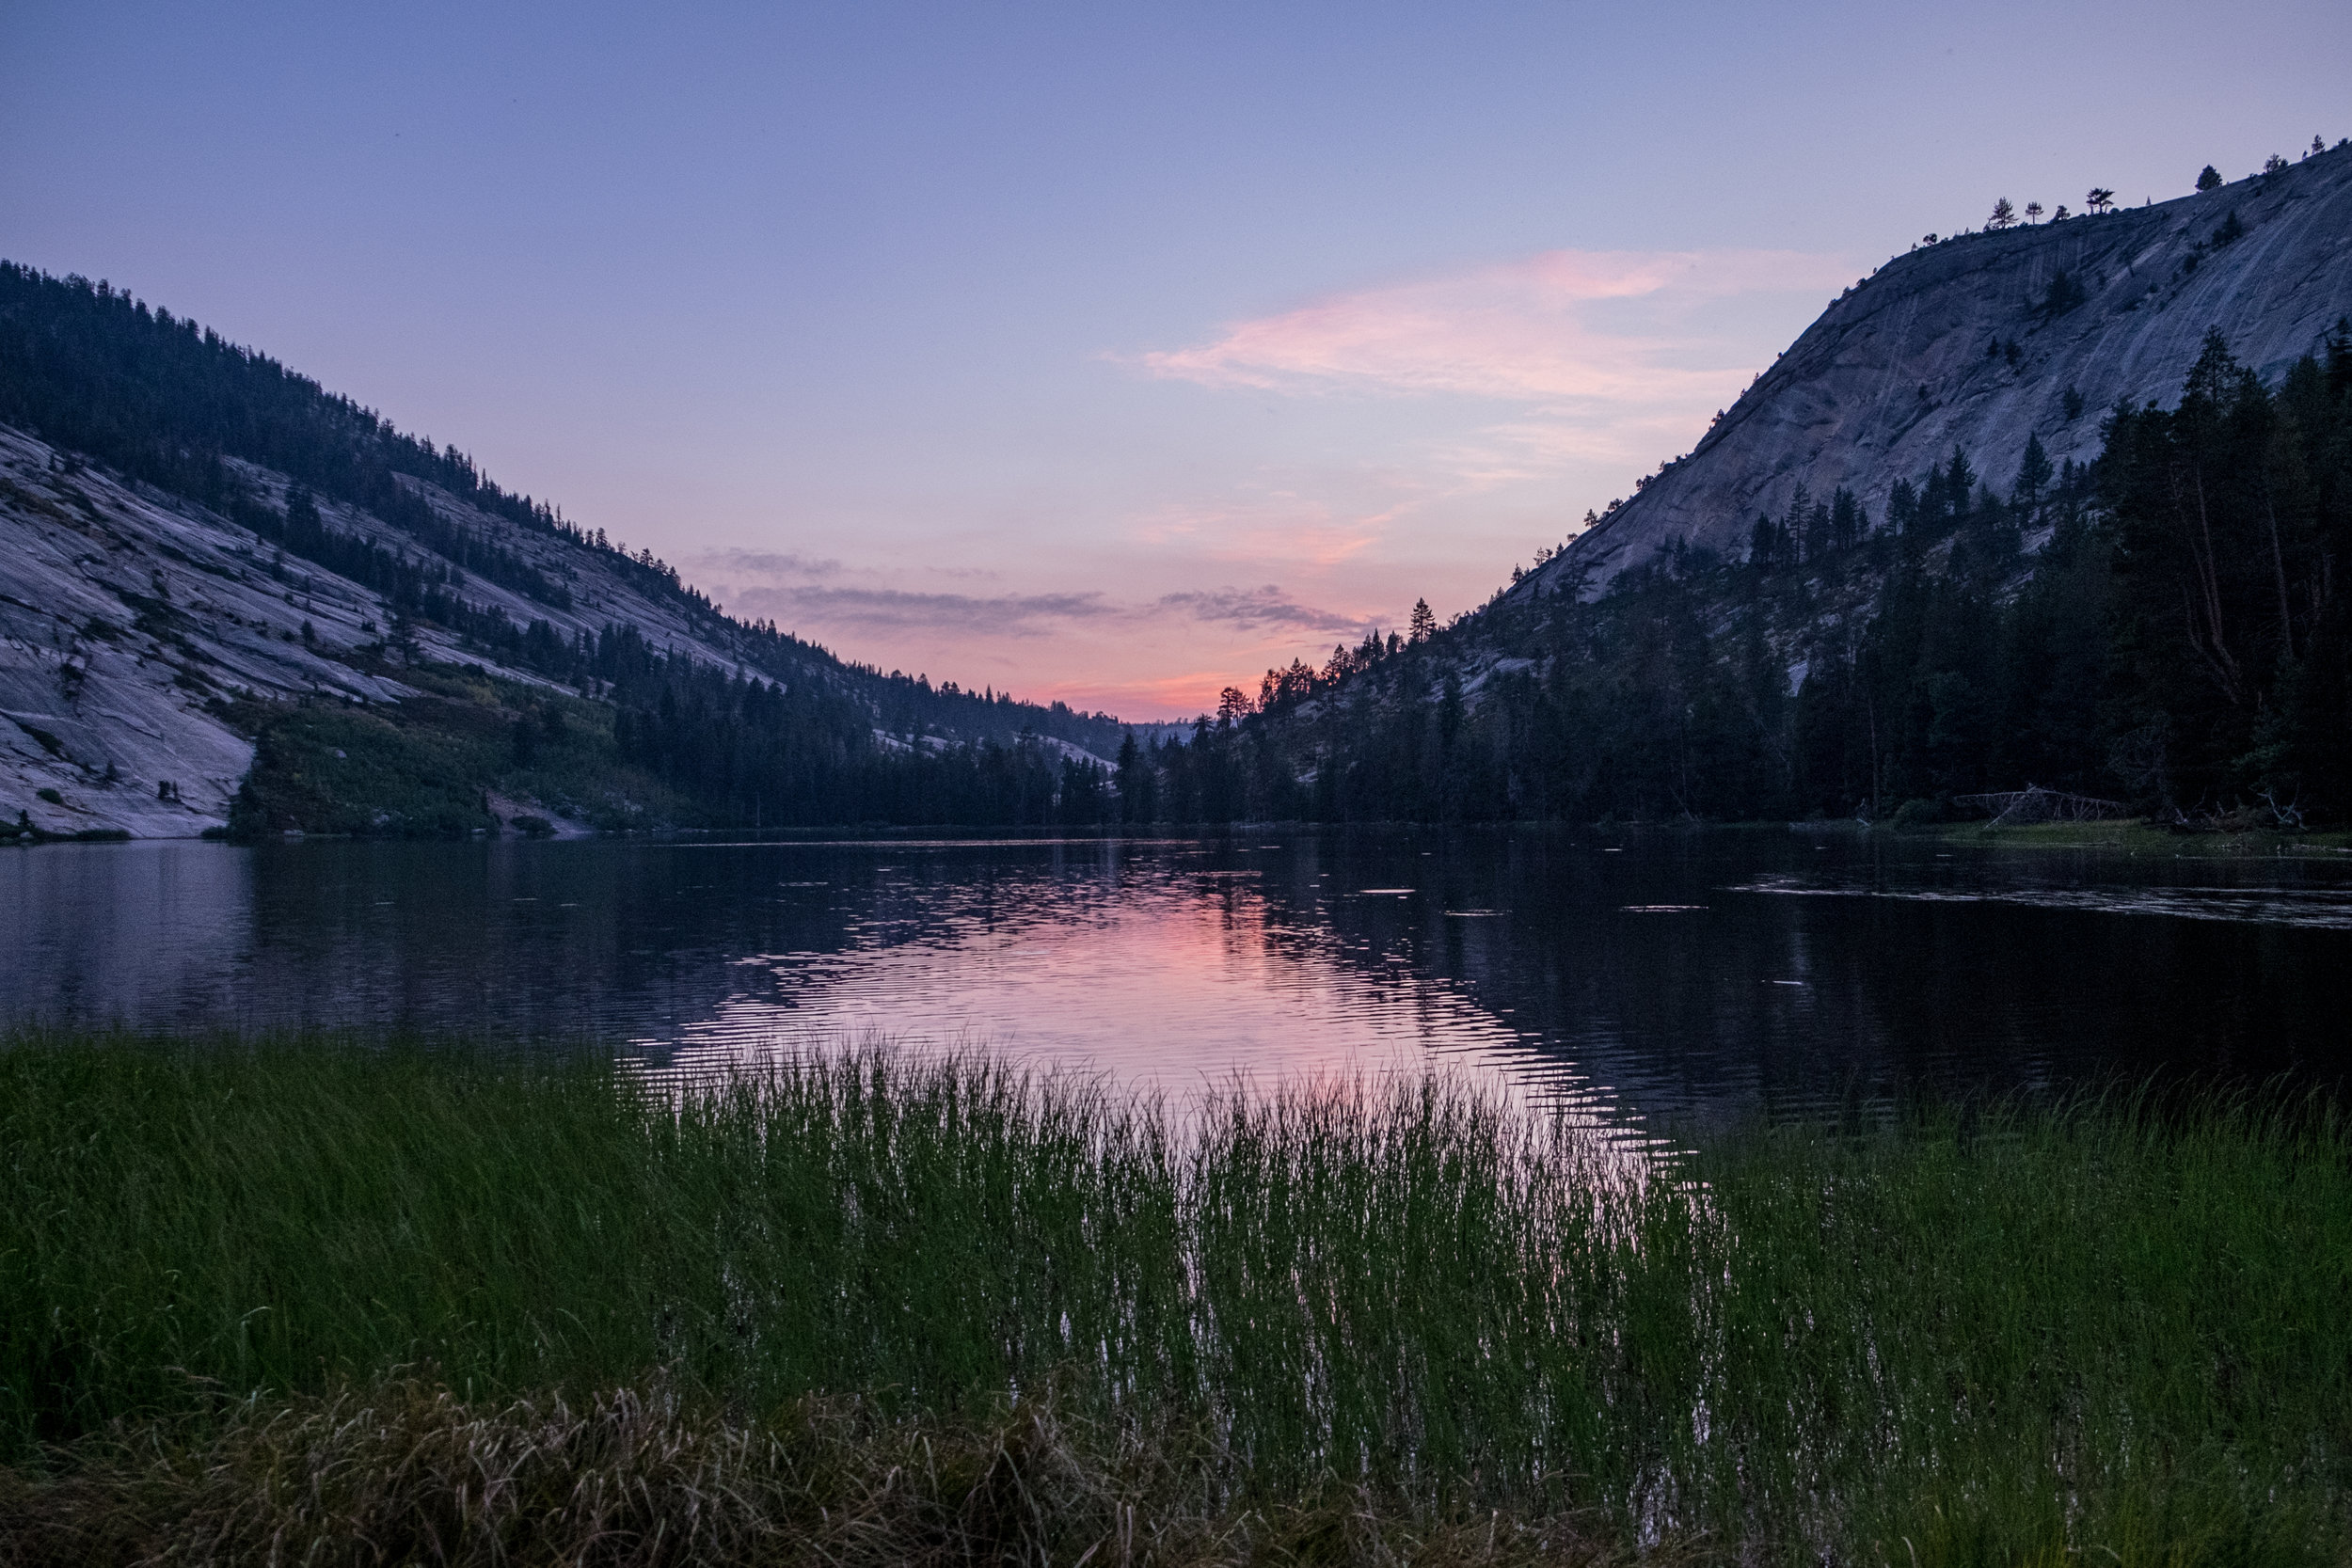 Merced Lake at sunset